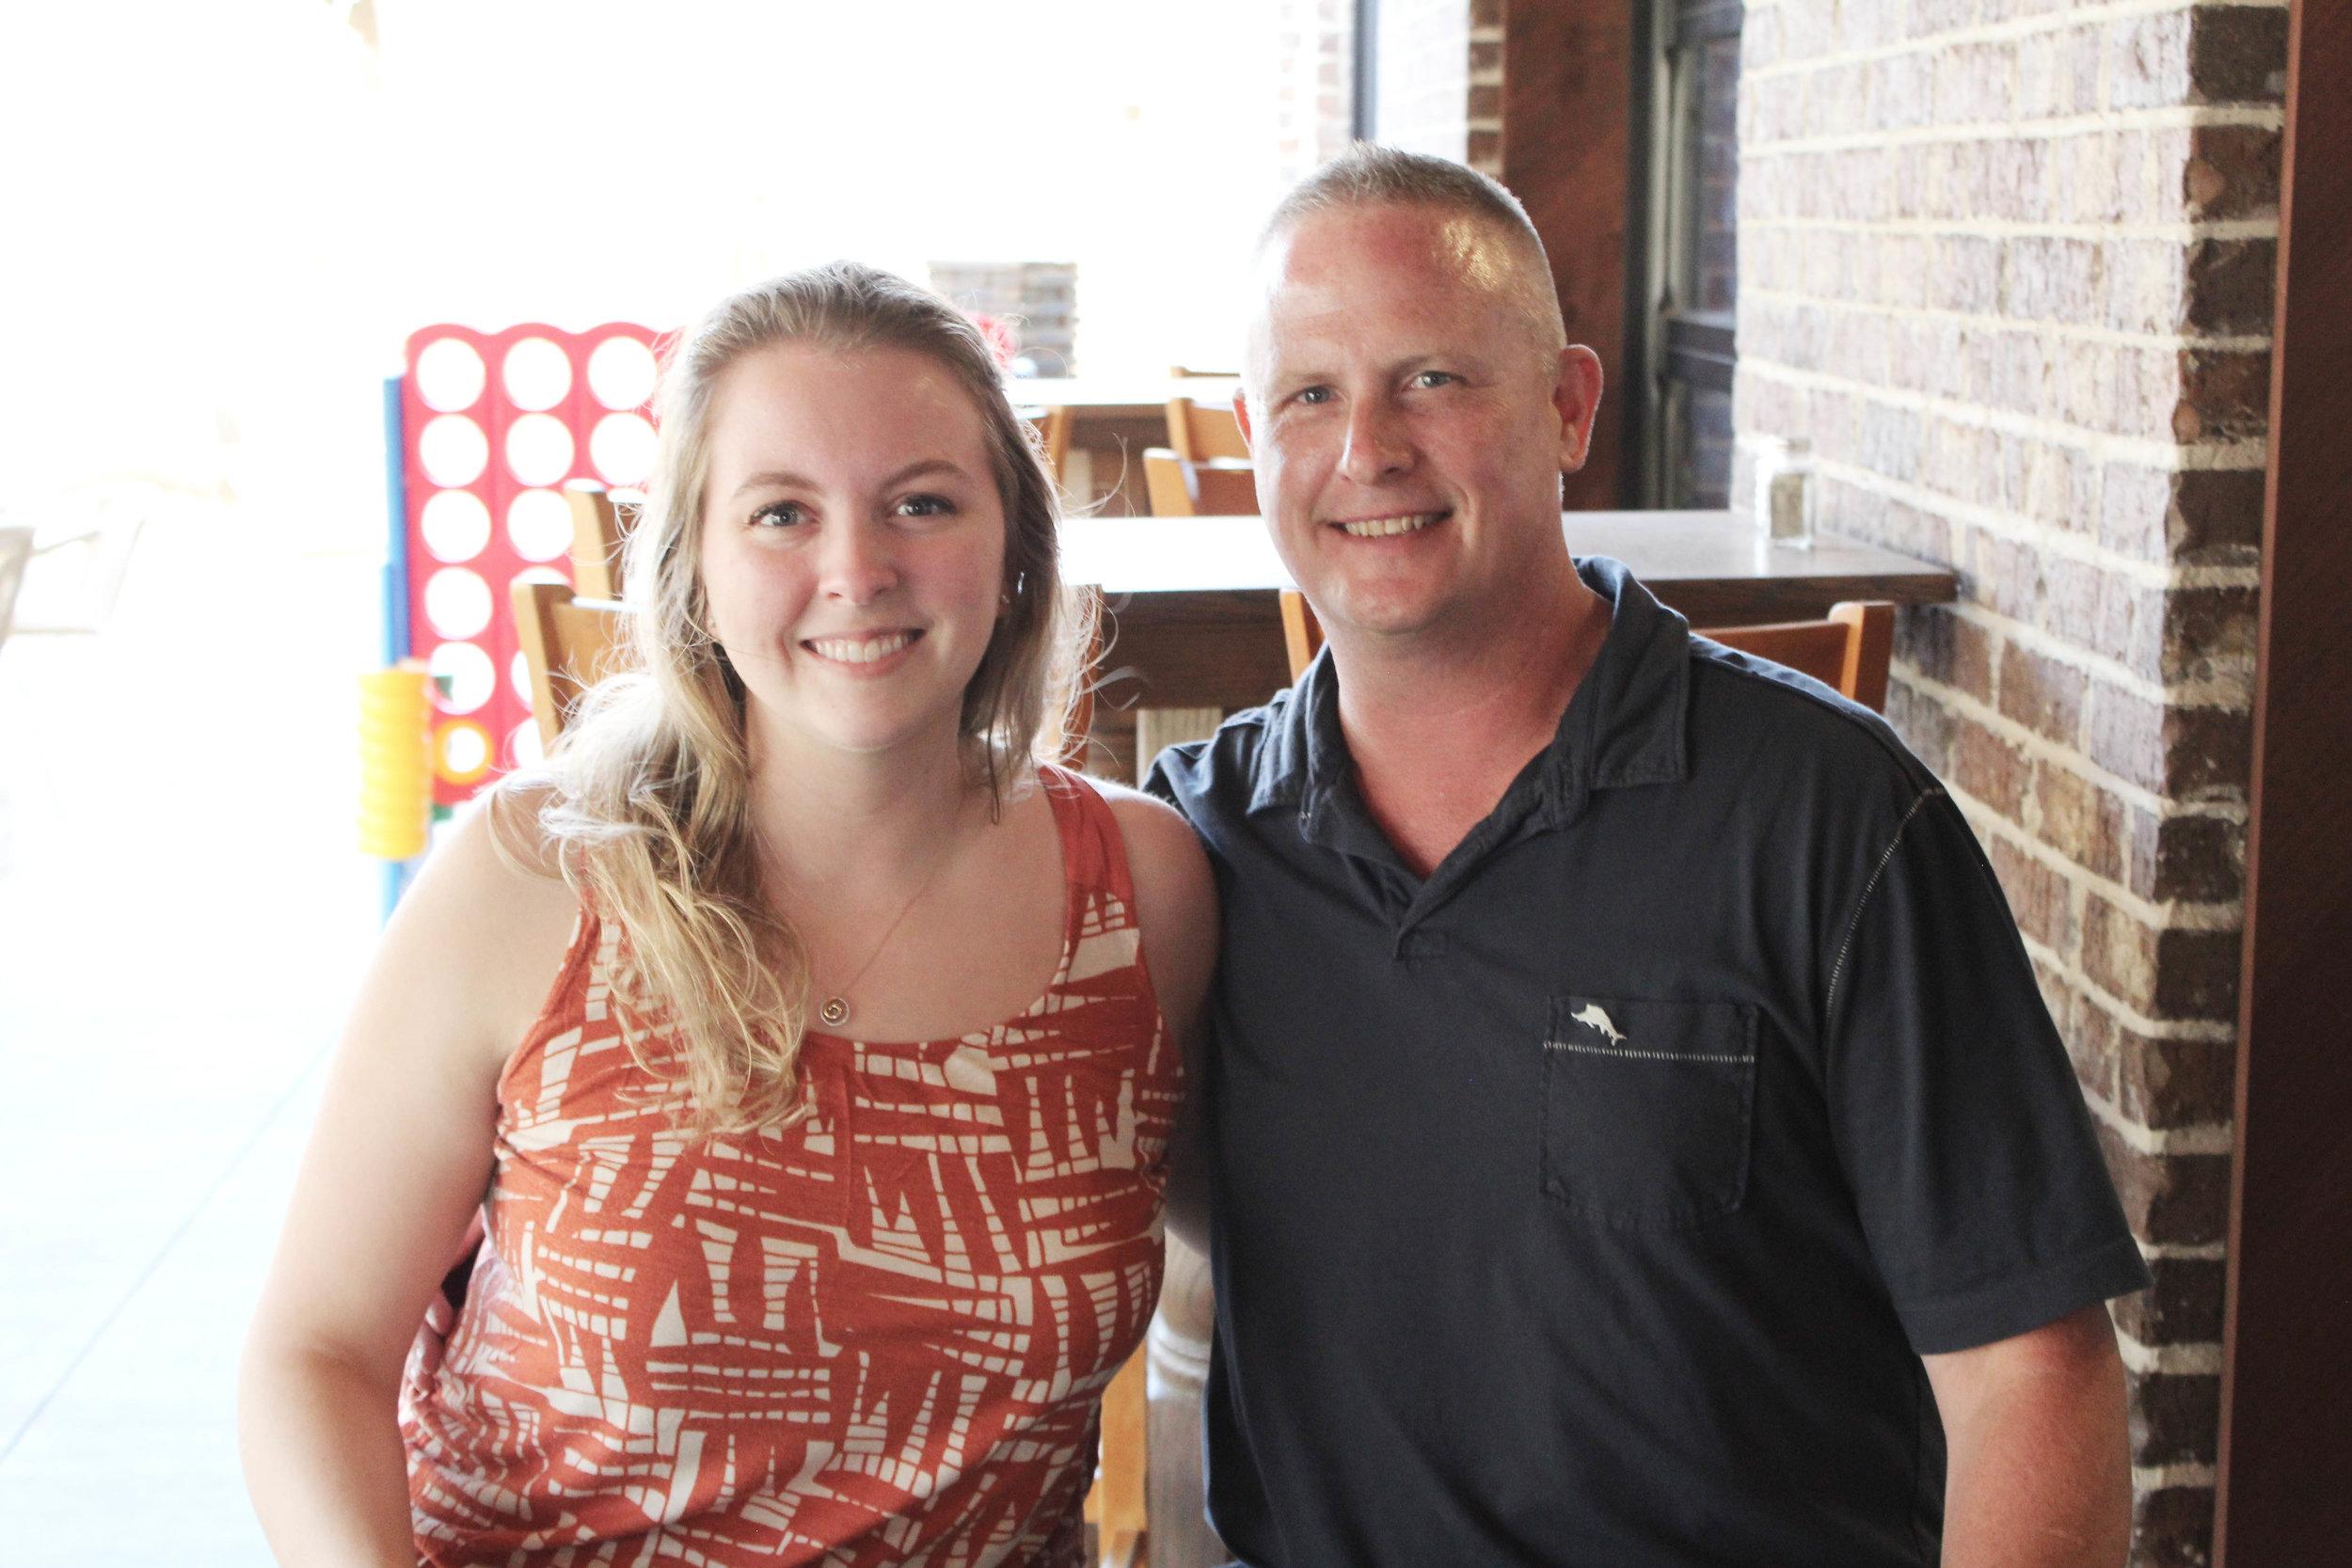 Claire Northam and Chris Moerke